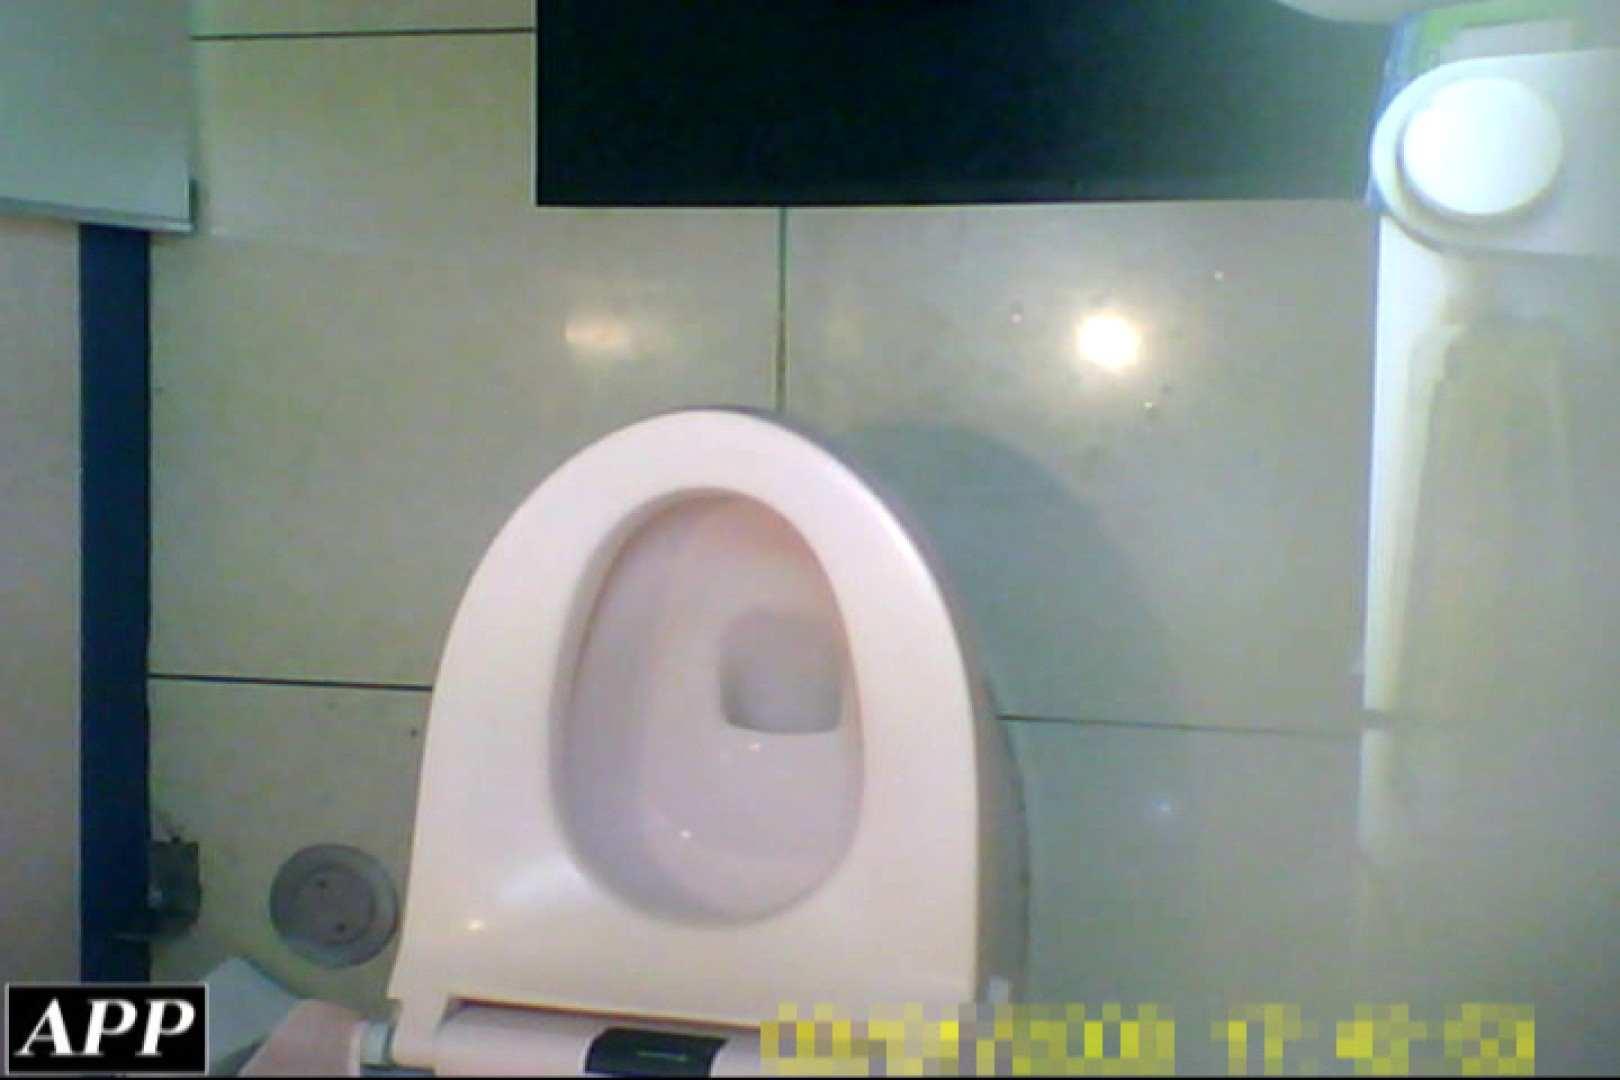 3視点洗面所 vol.004 OLエロ画像  107PICs 24